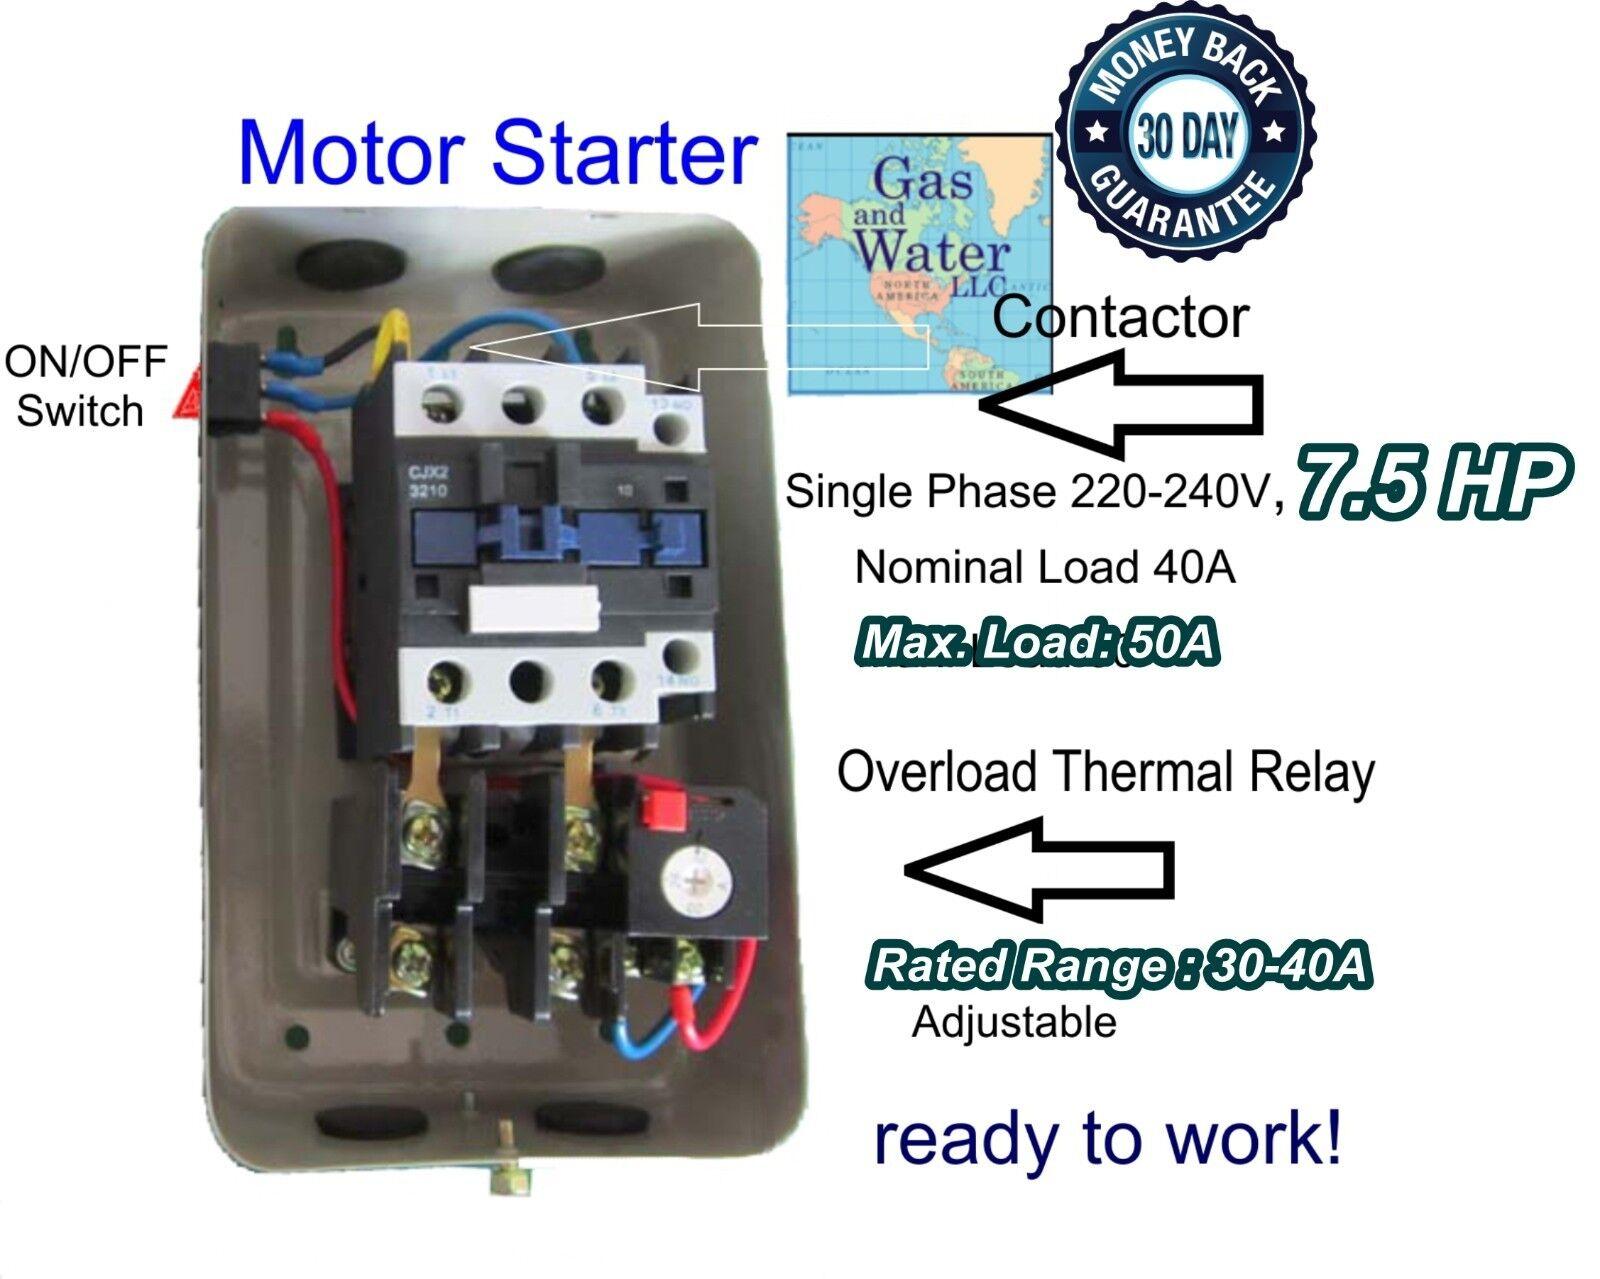 $_57?set_idd880000500F magnetic starter wiring diagram efcaviation com magnetic switch wiring diagram at reclaimingppi.co